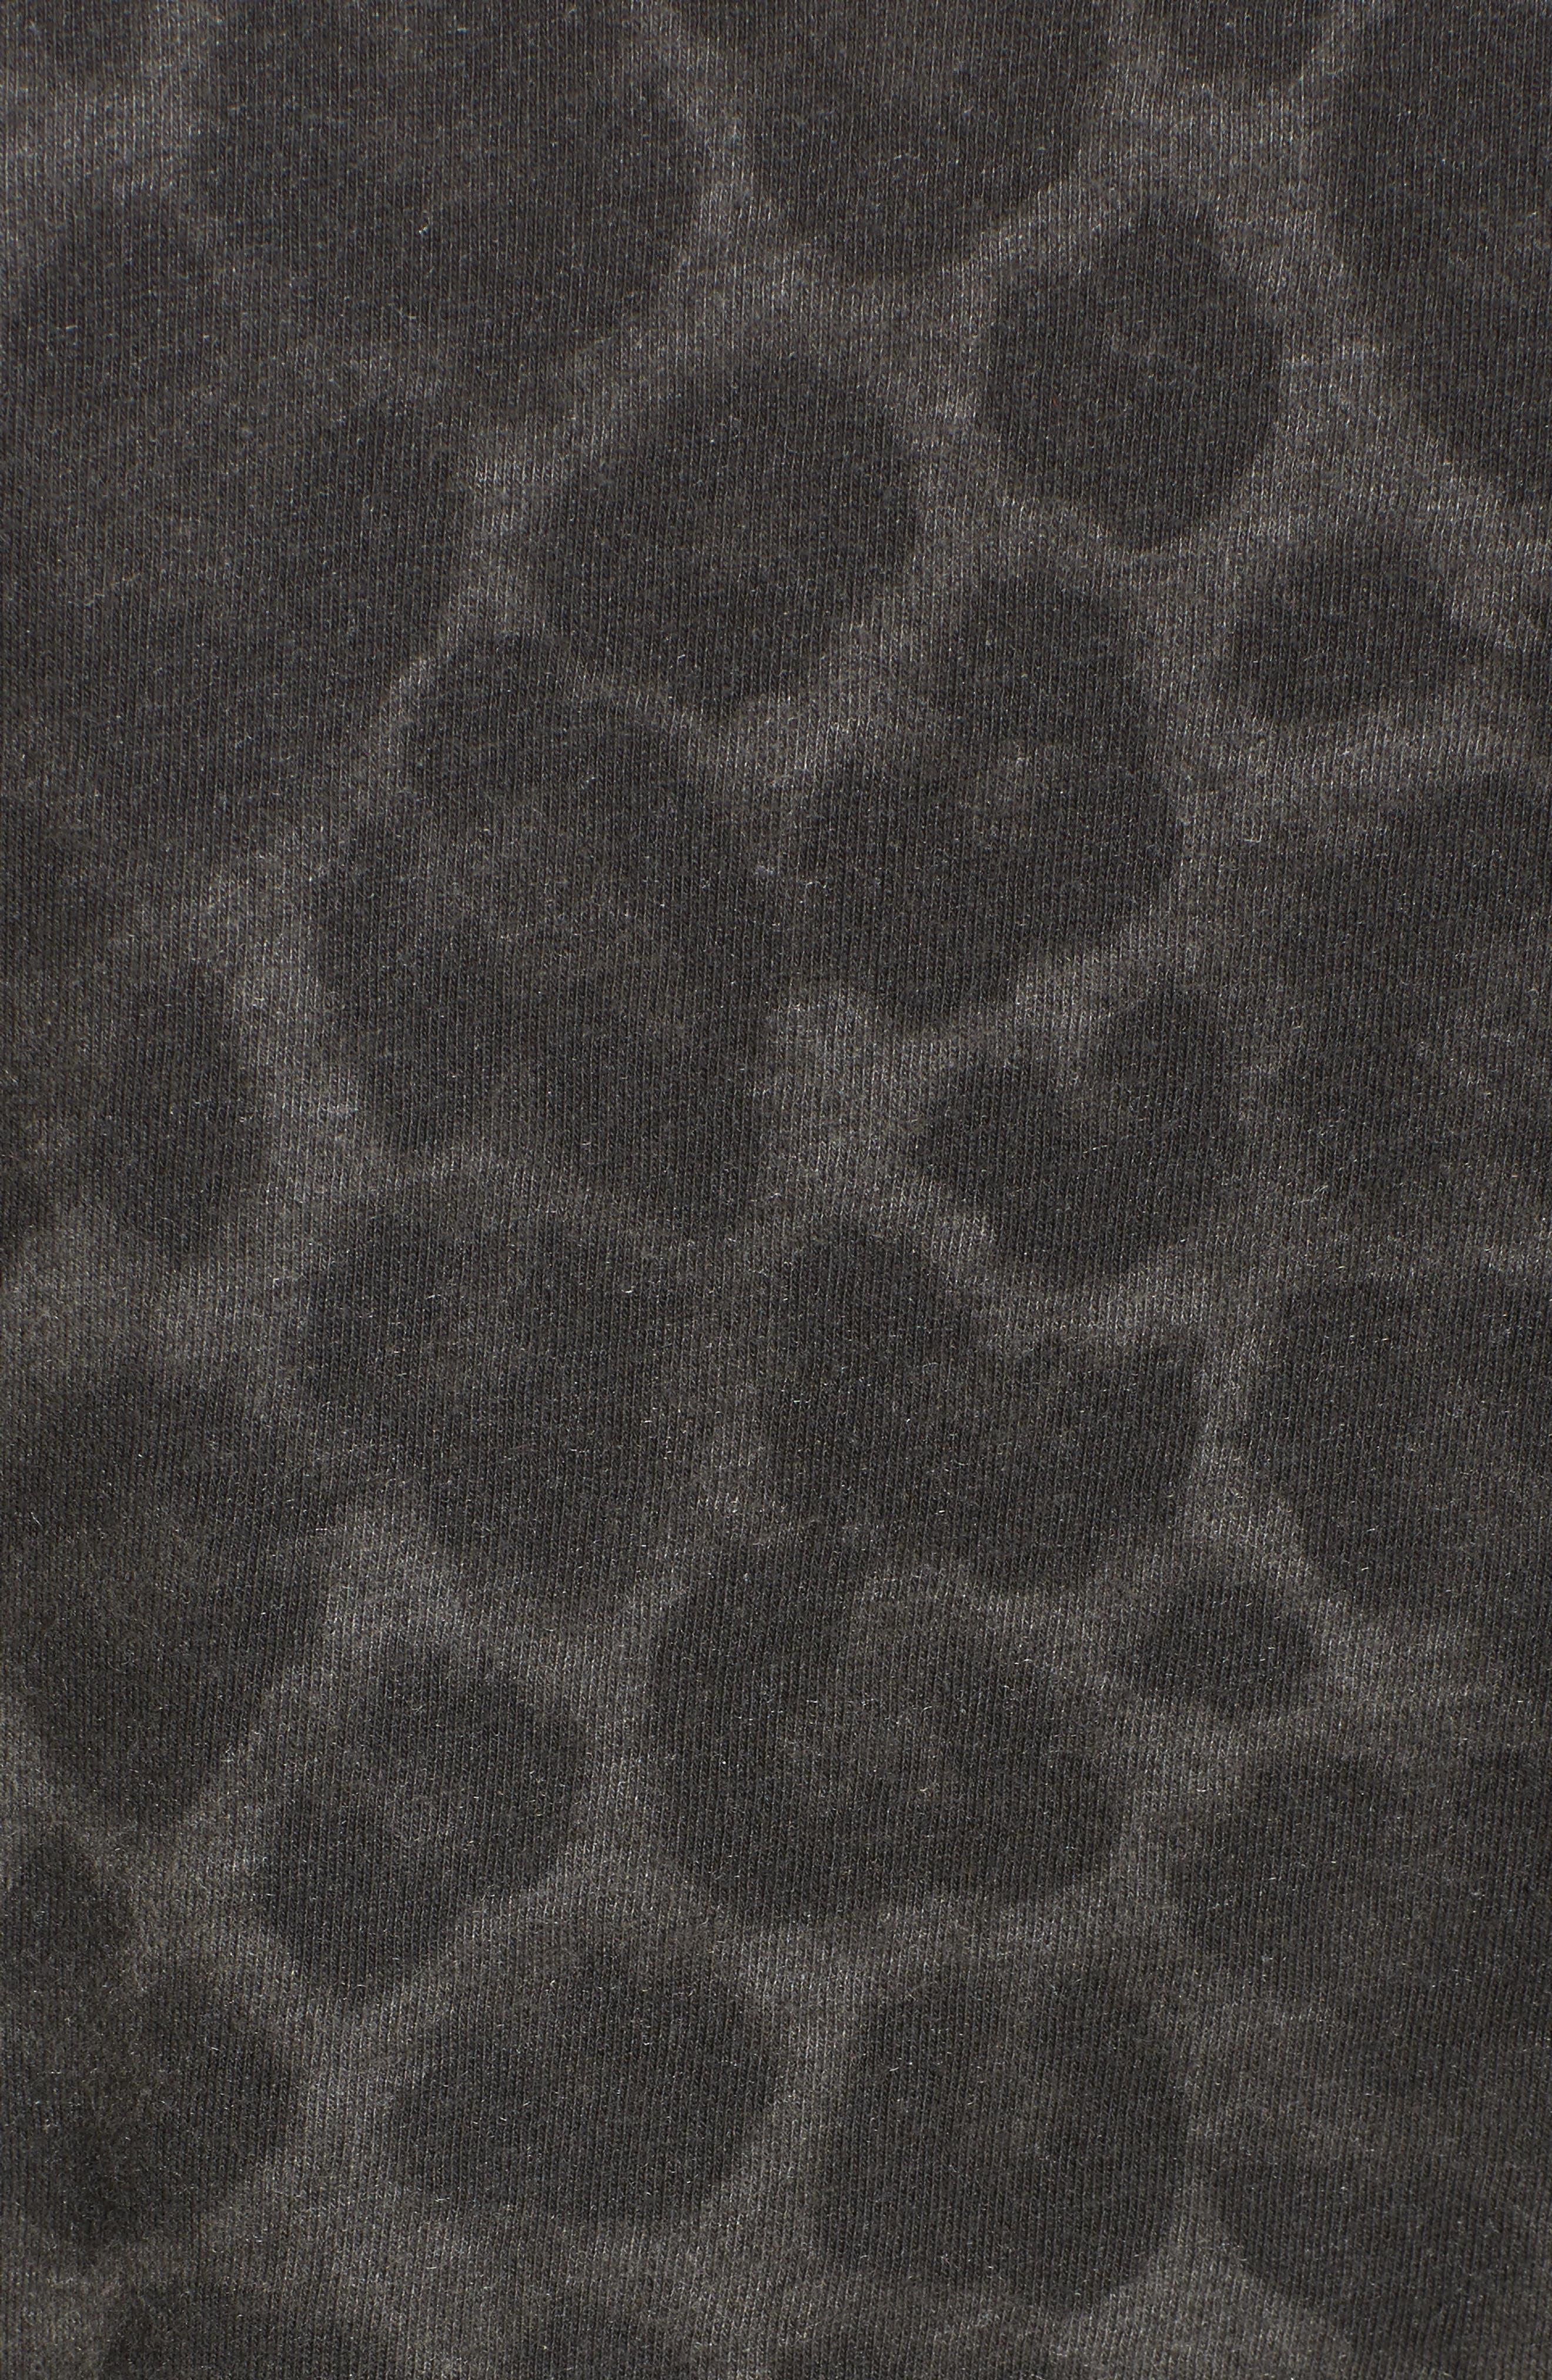 Choker Top,                             Alternate thumbnail 5, color,                             Leopard Print